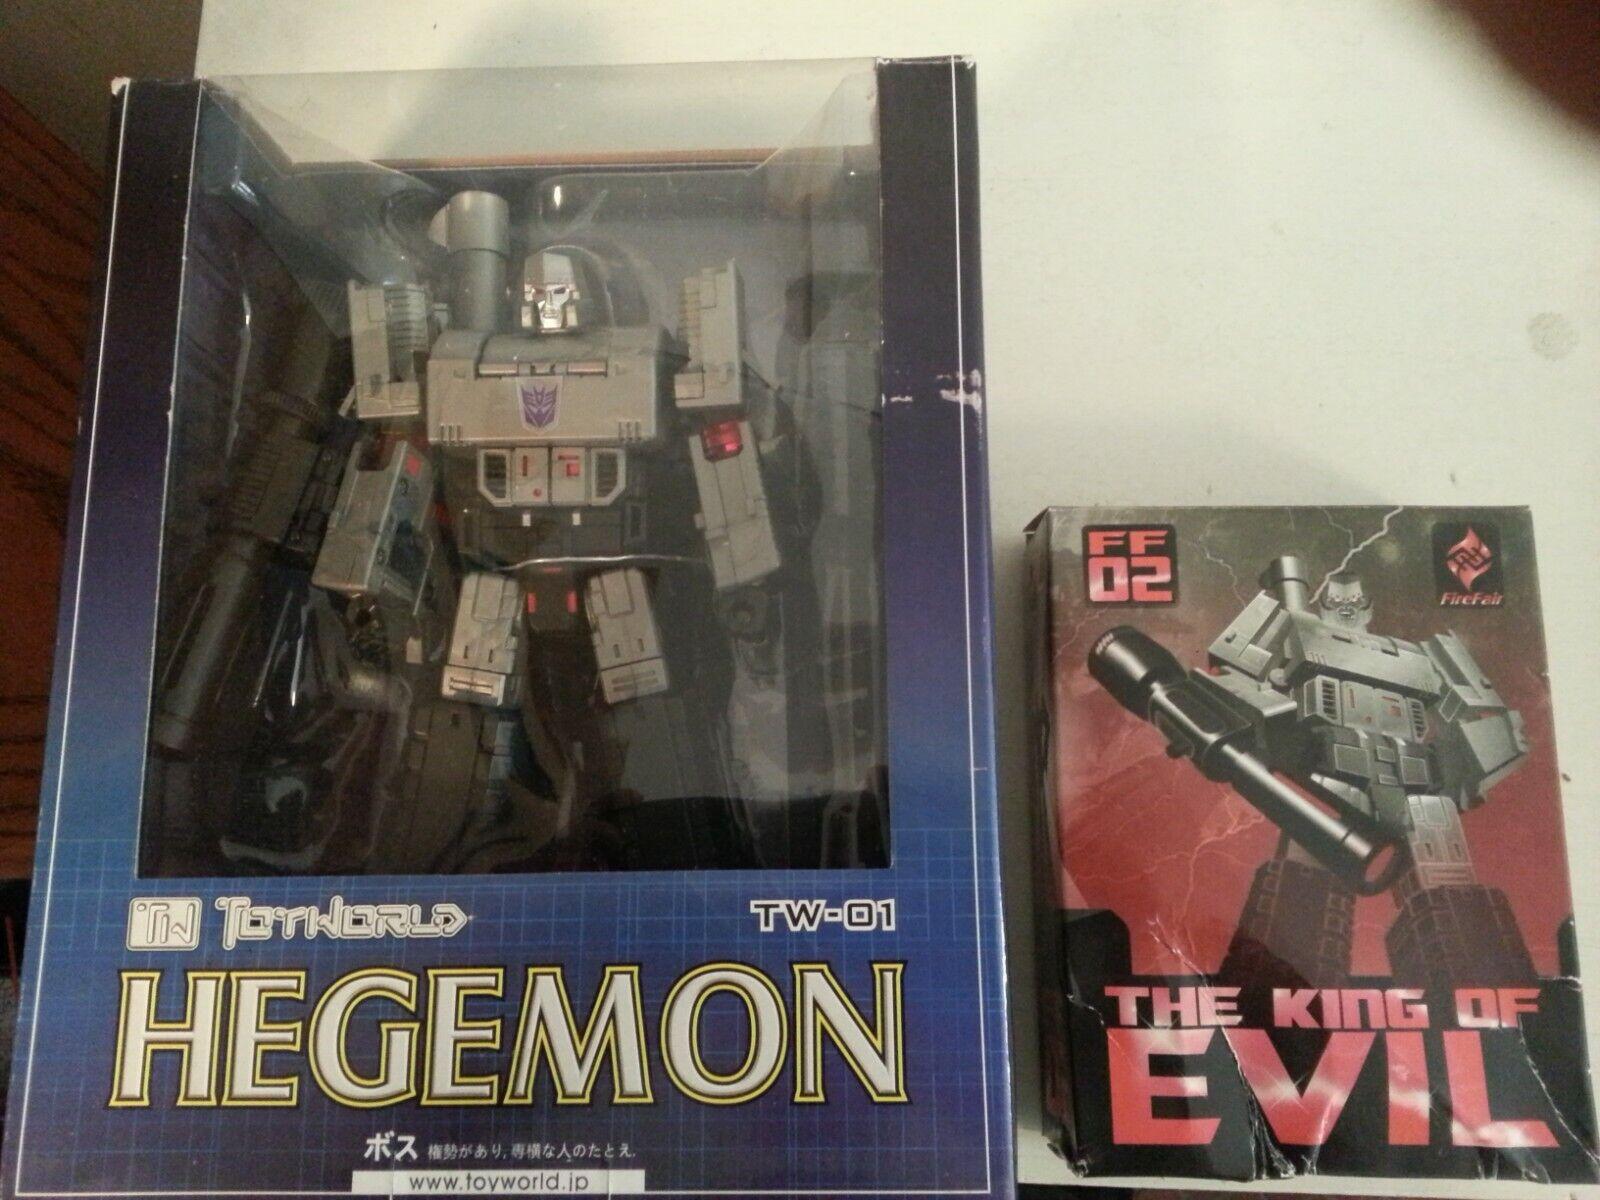 Transfomers Megatron Toyworld TW-01 Hegemon 1st ver w  King of Evil add on kit